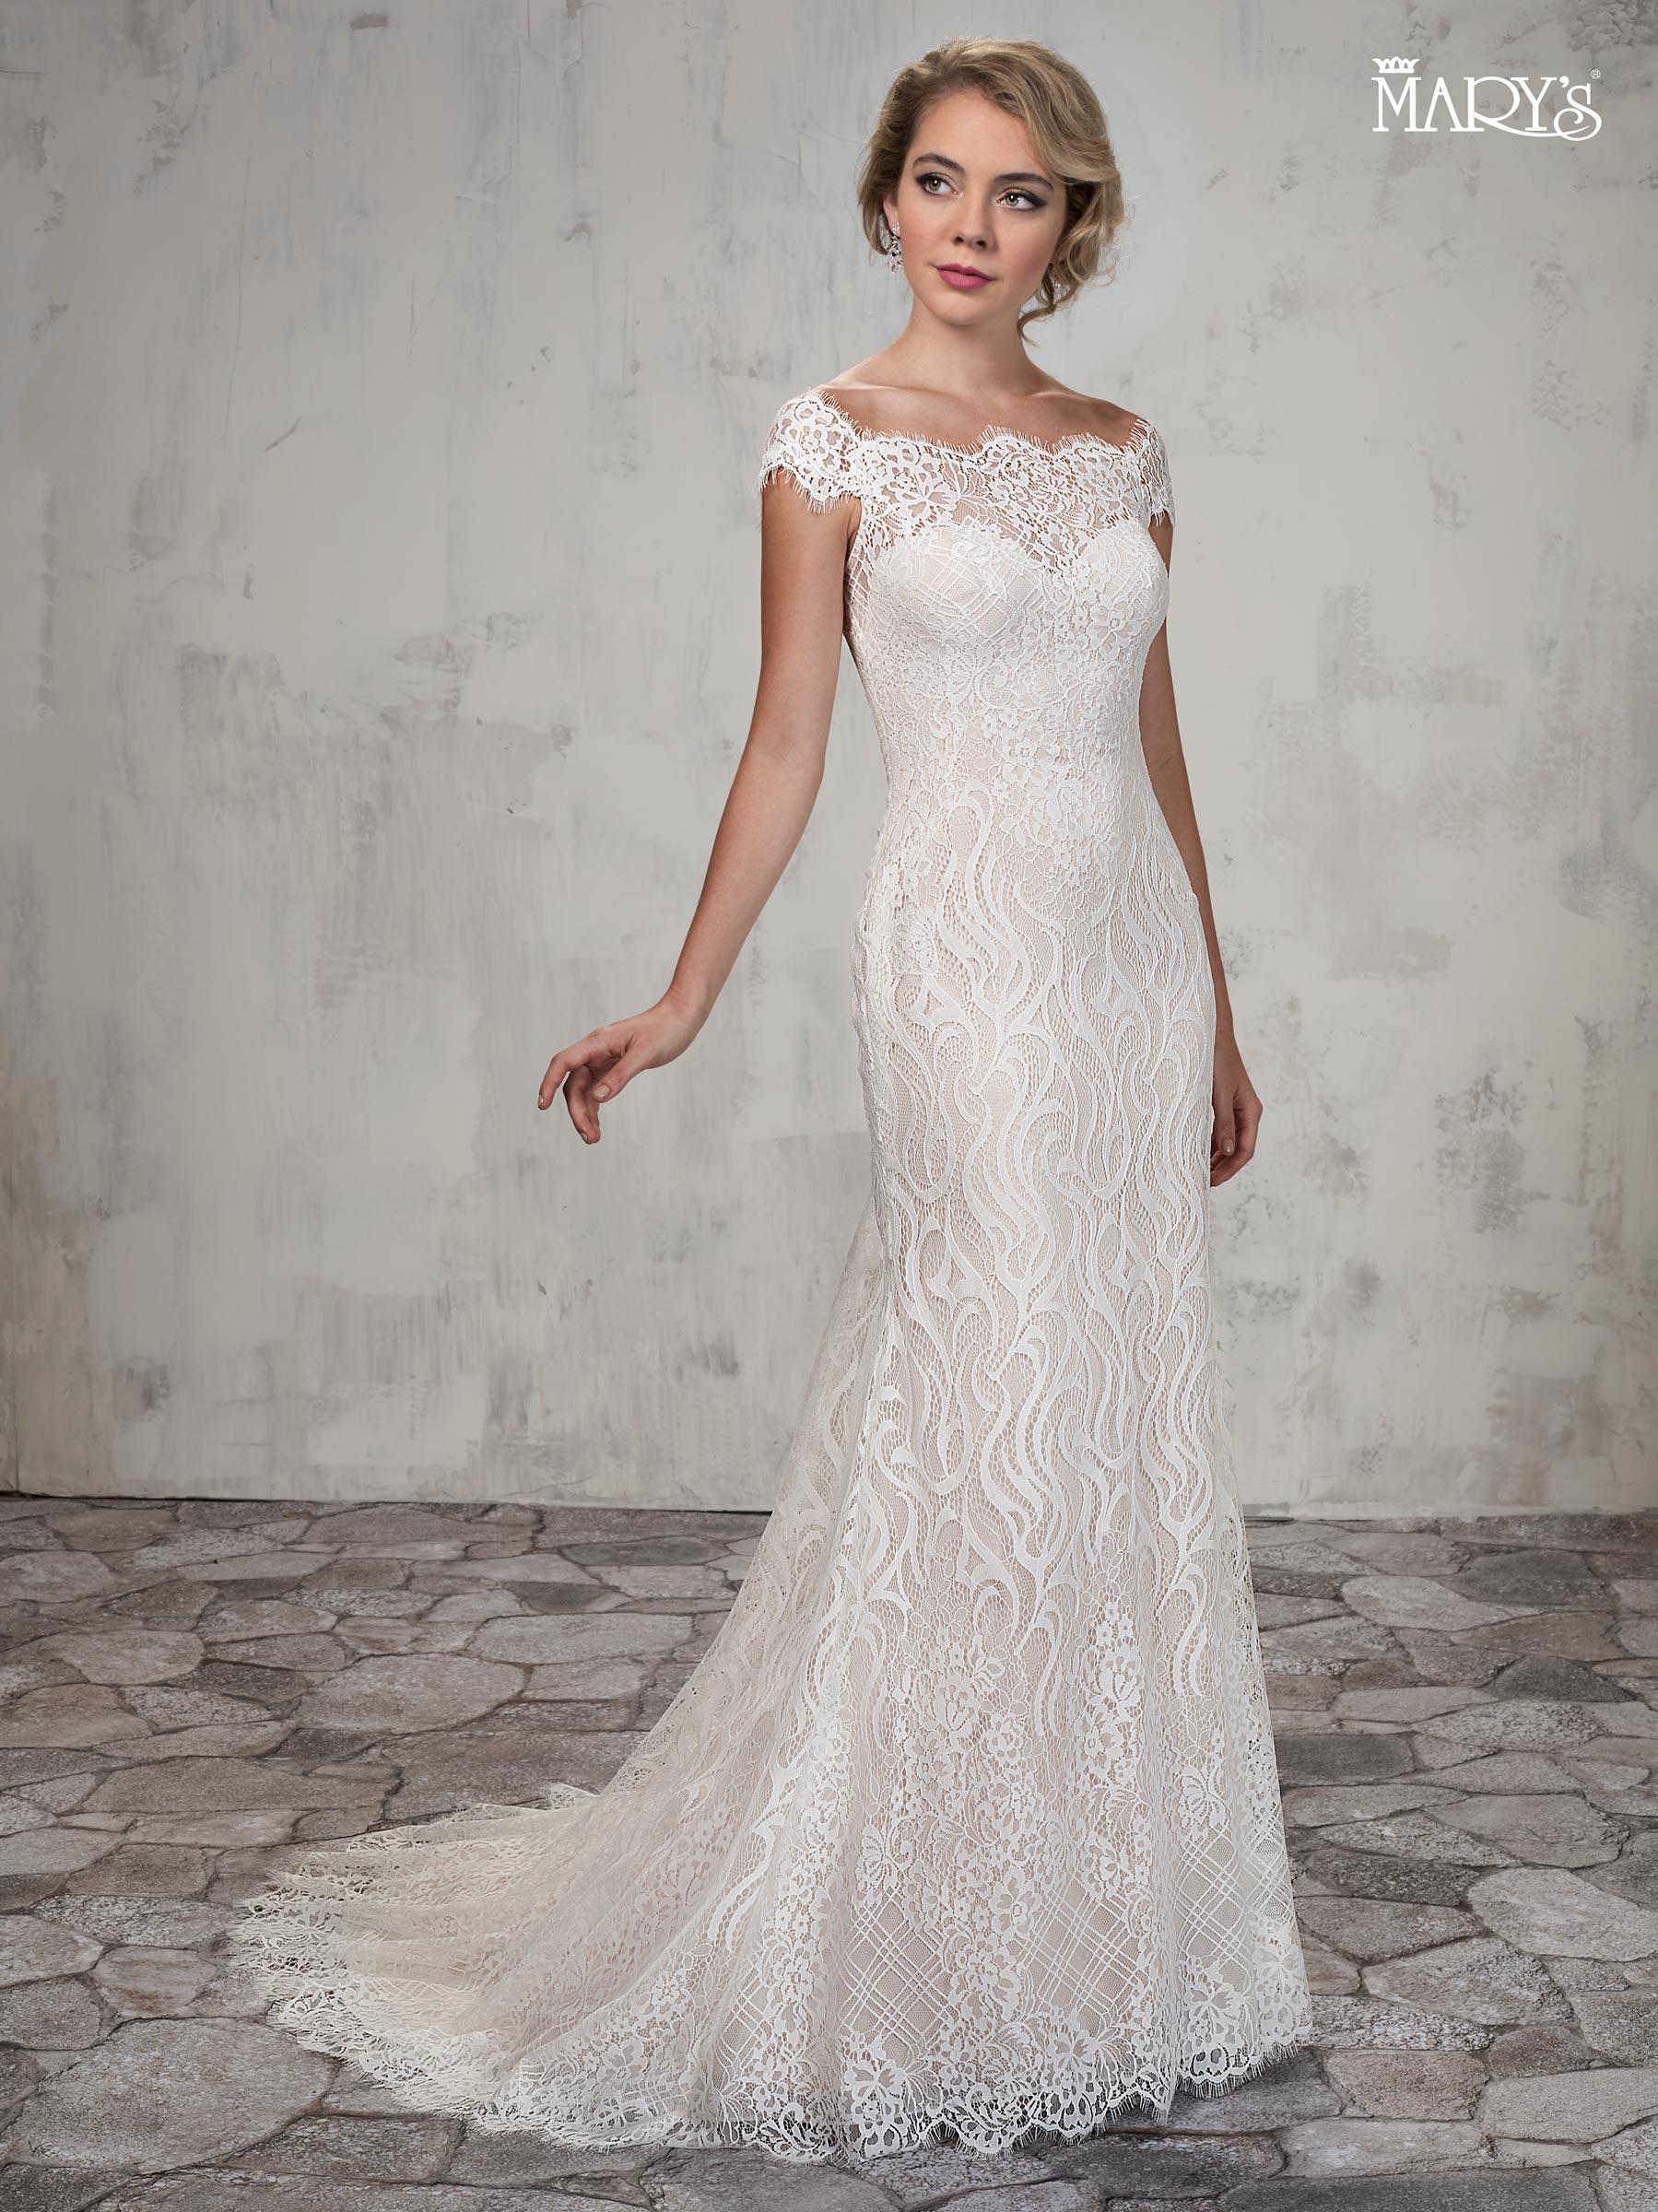 Bridal Wedding Dresses | Mary's | Style - MB3024